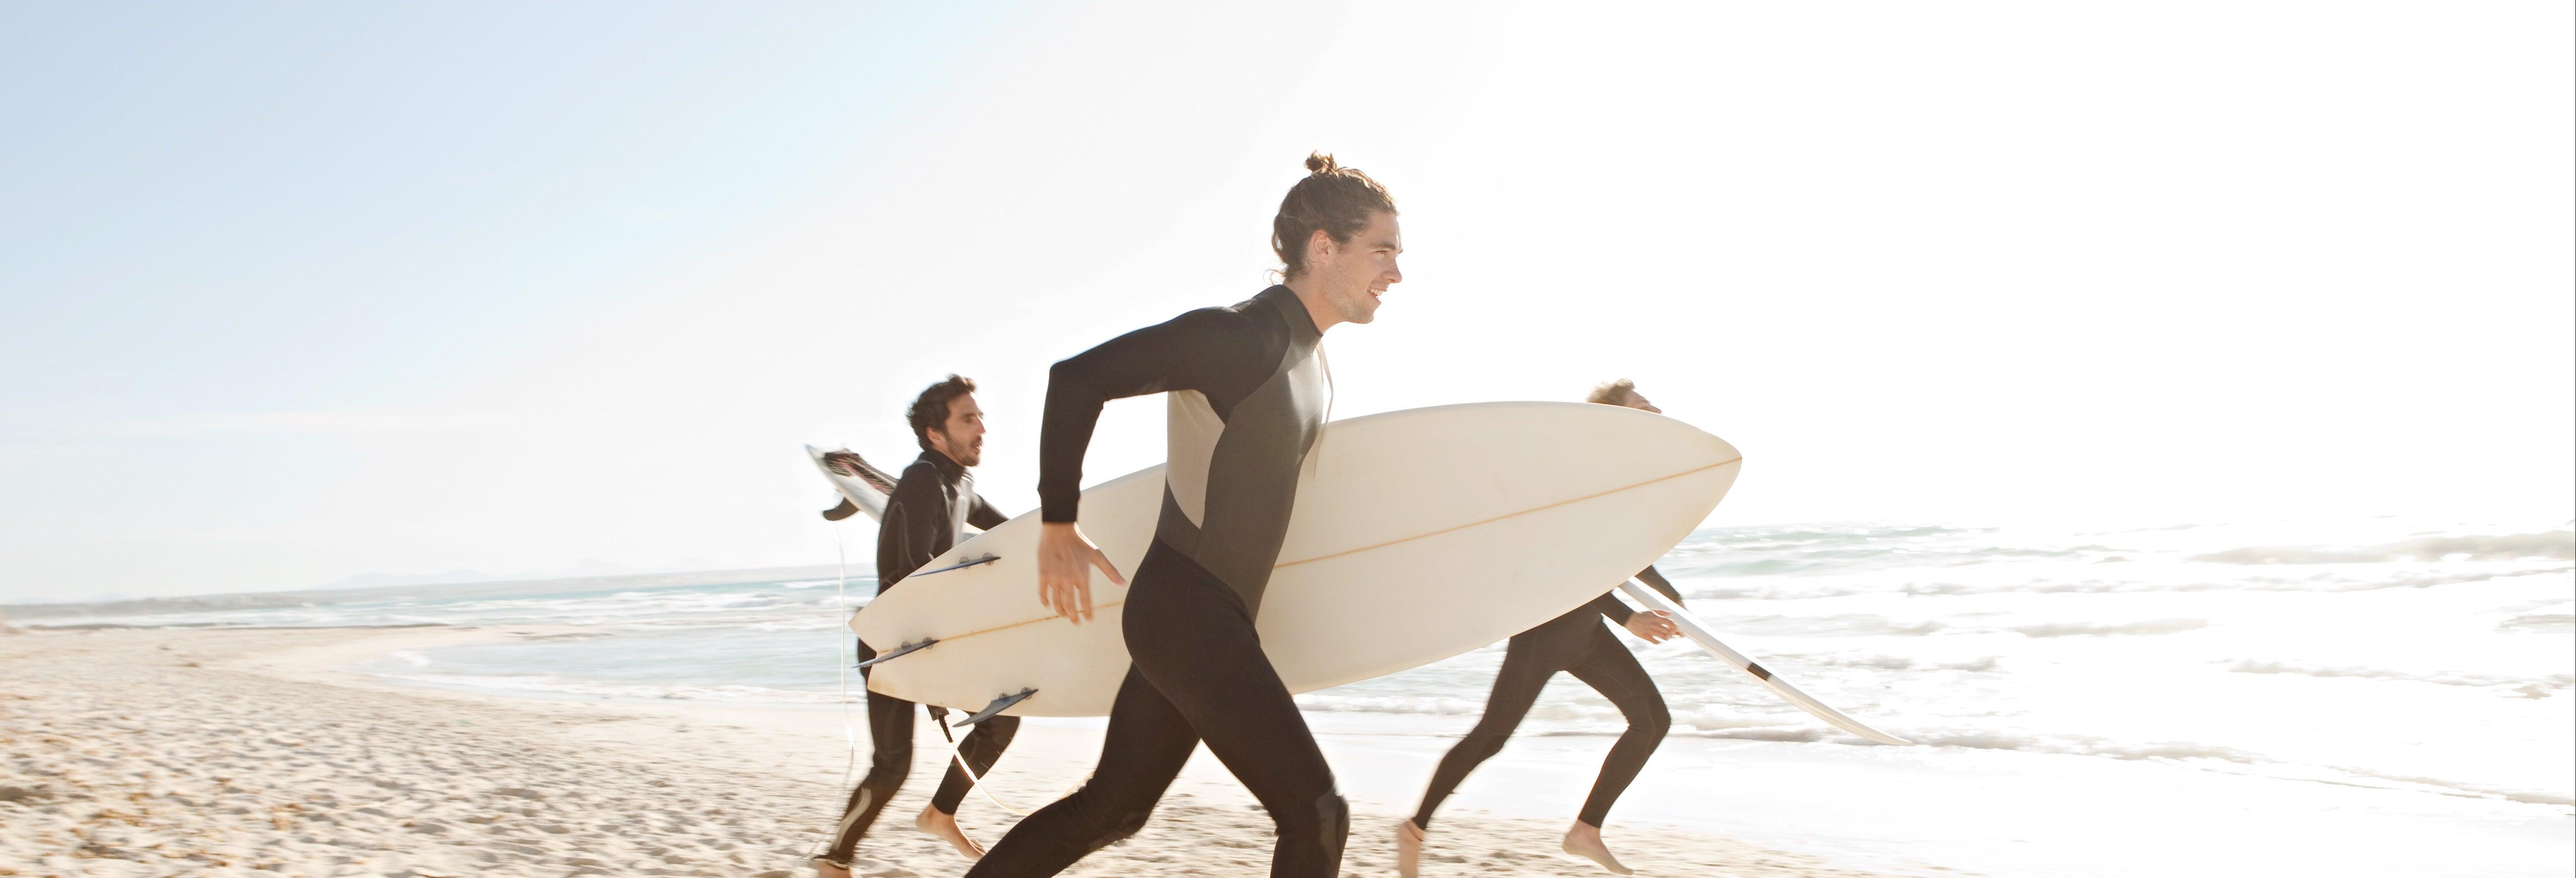 Corso di surf a Praia da Galé